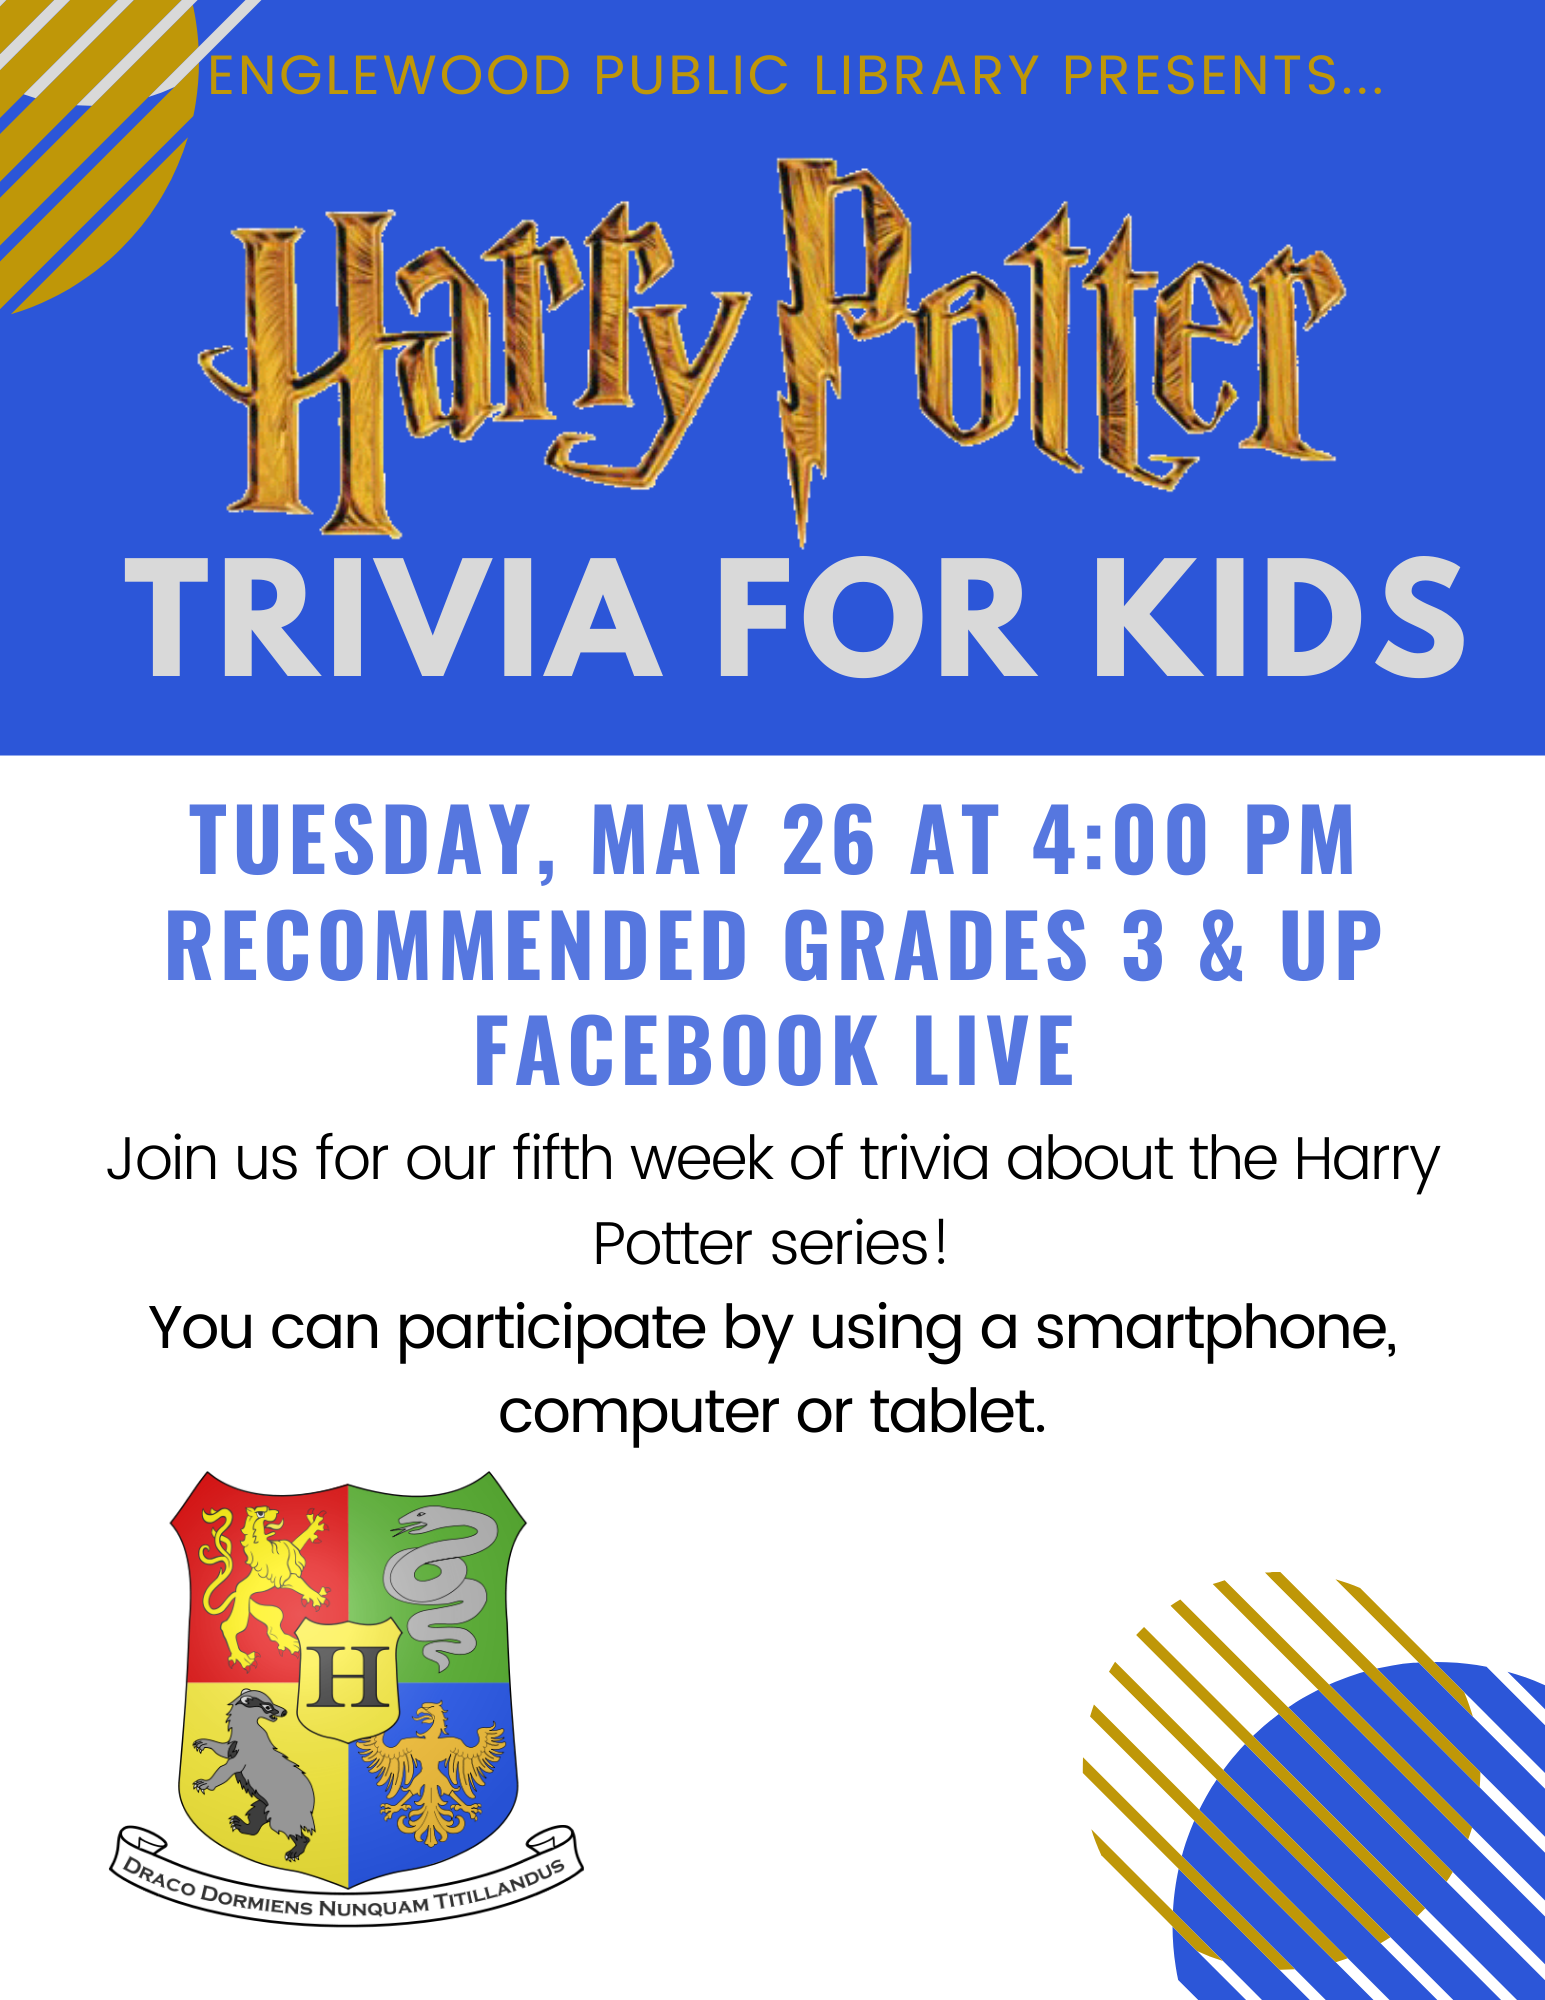 Harry Potter Trivia for Kids